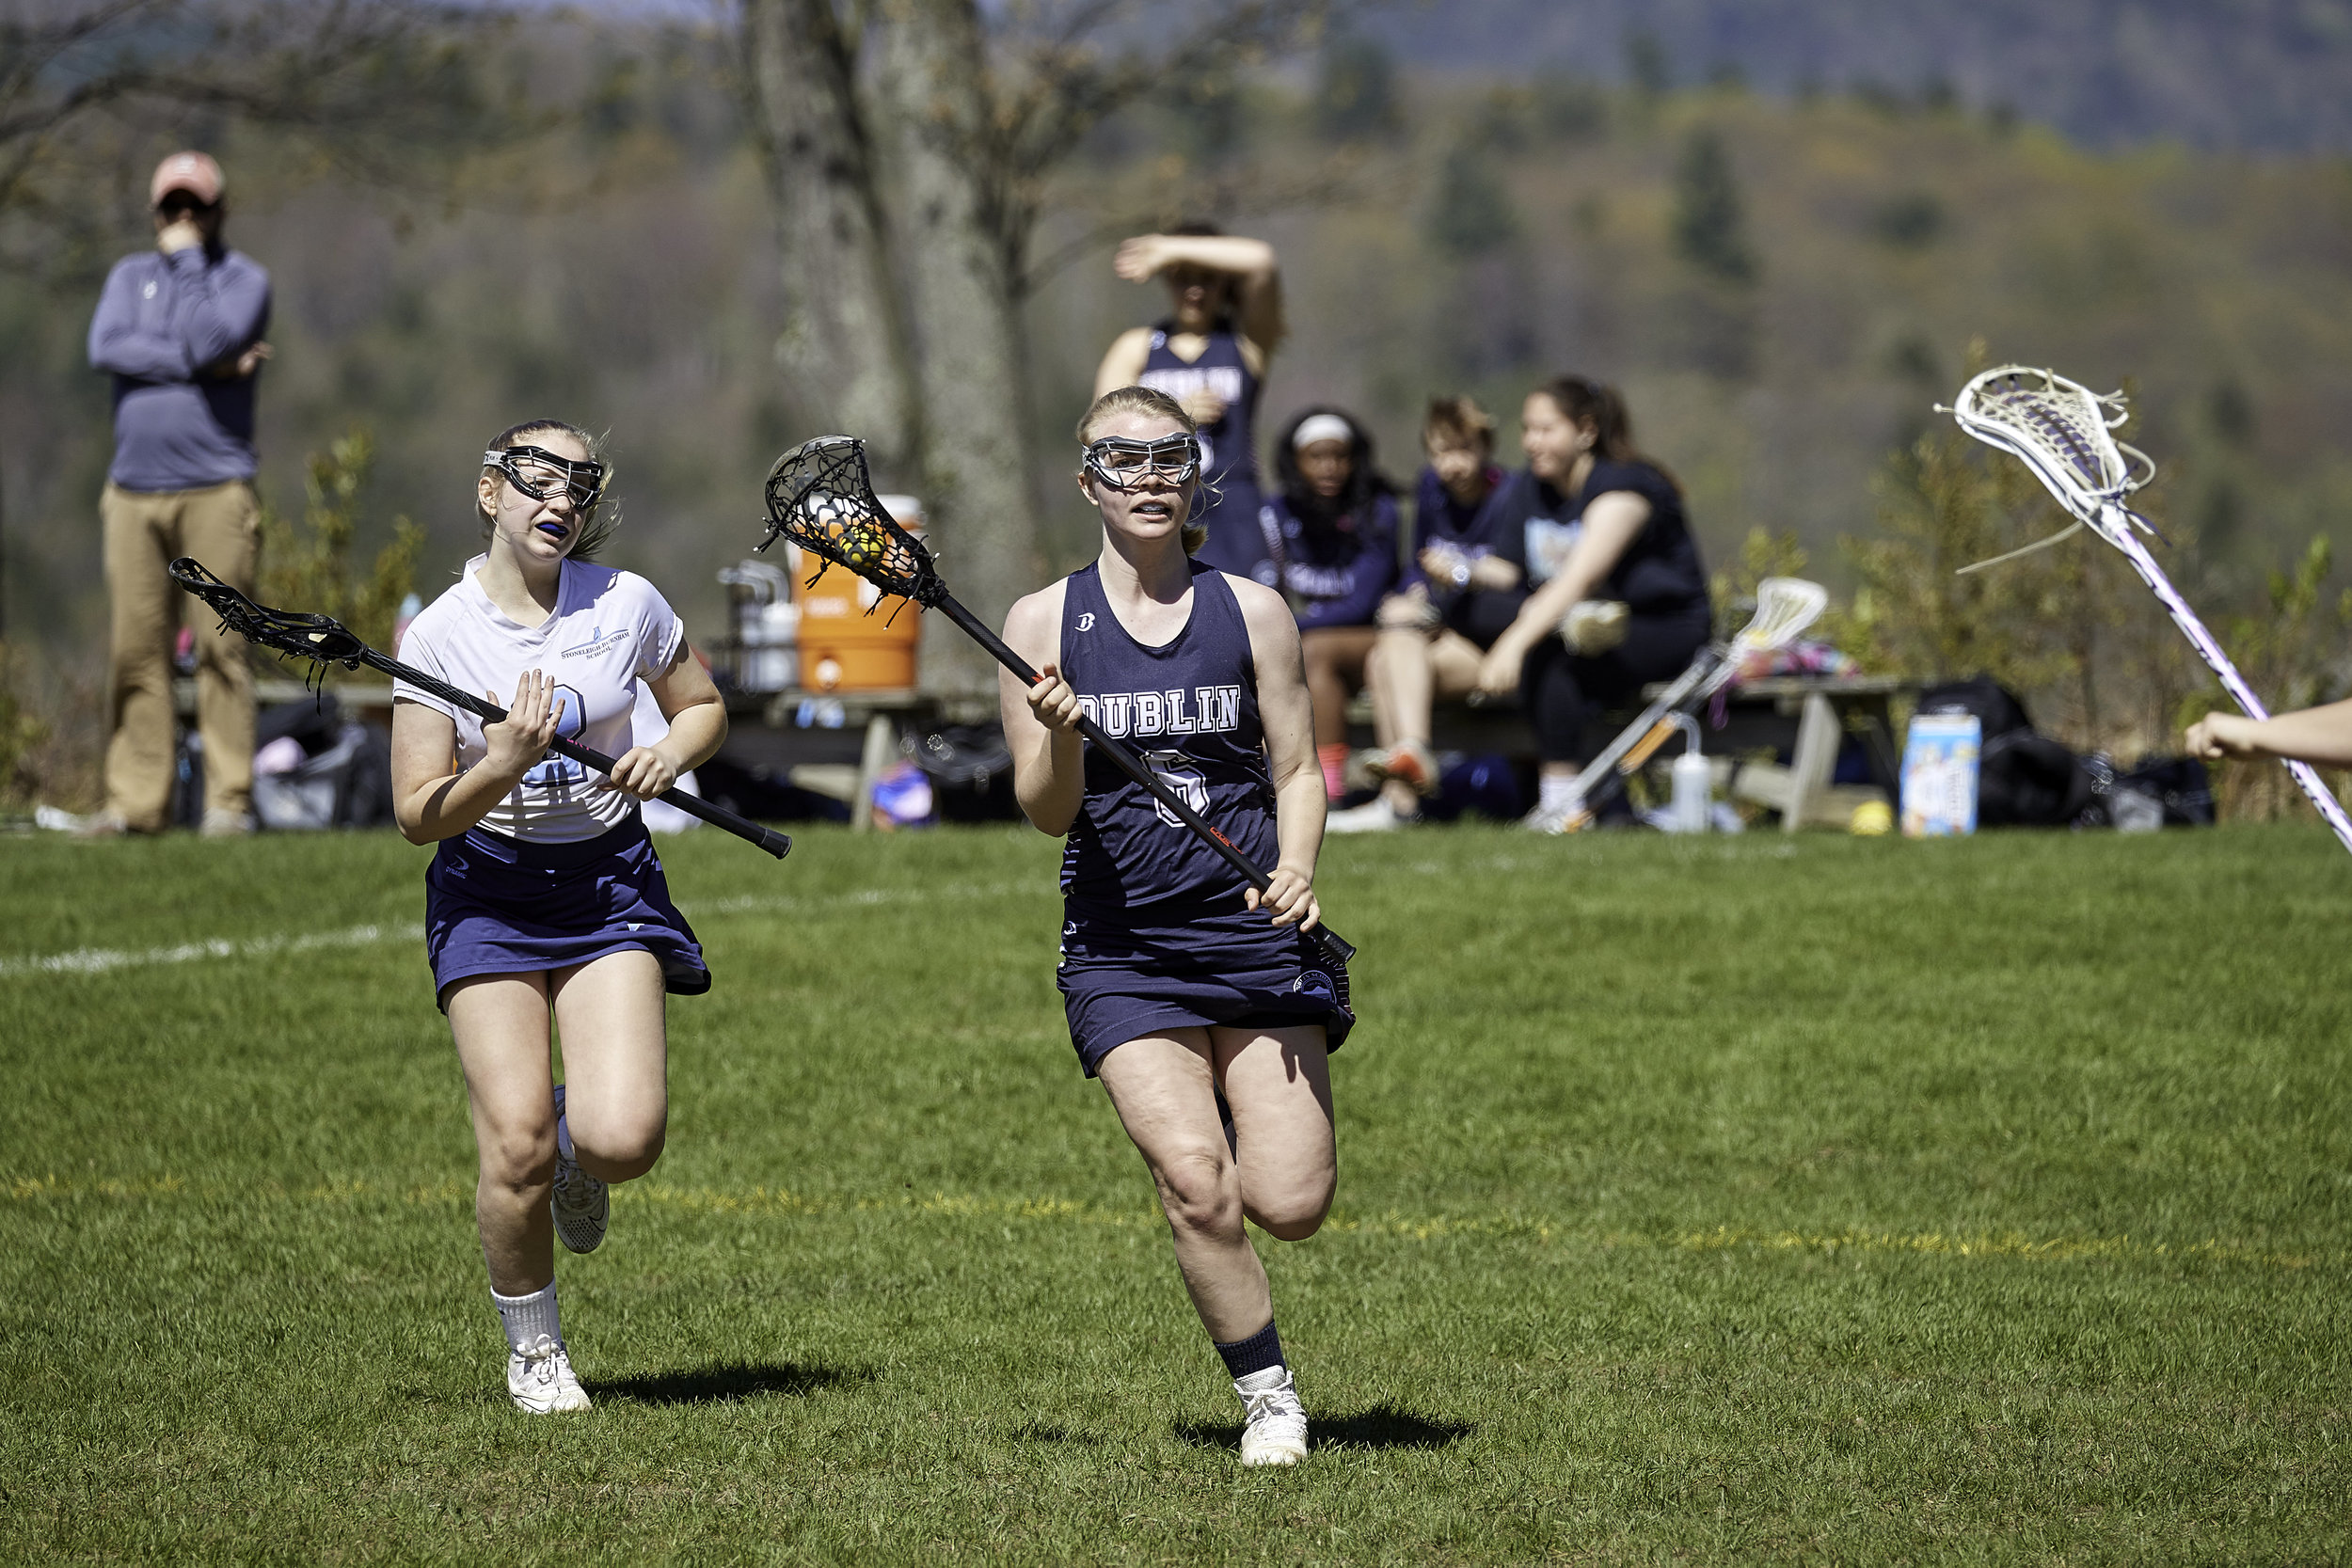 Girls Lacrosse vs. Stoneleigh Burnham School - May 11, 2019 - May 10, 2019193341.jpg